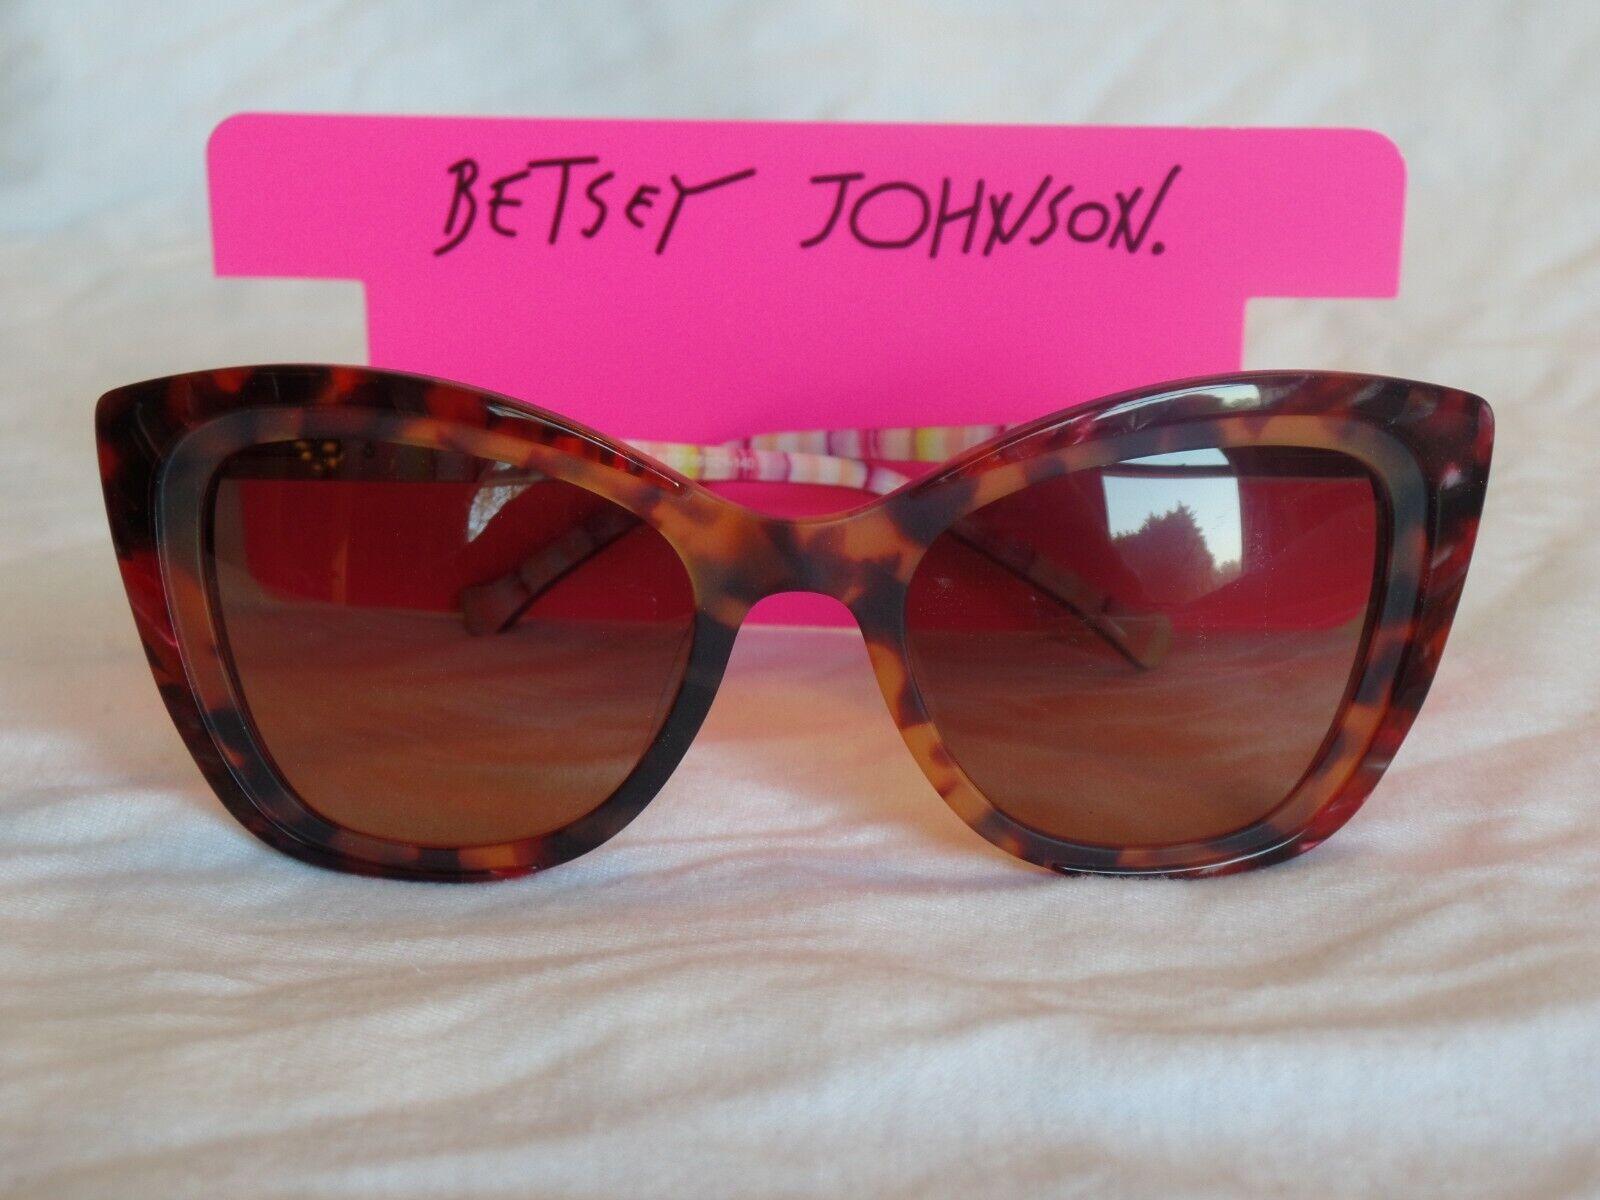 New Women's Betsey Johnson Sunglasses Save The Drama Red Plastic 55-21-140